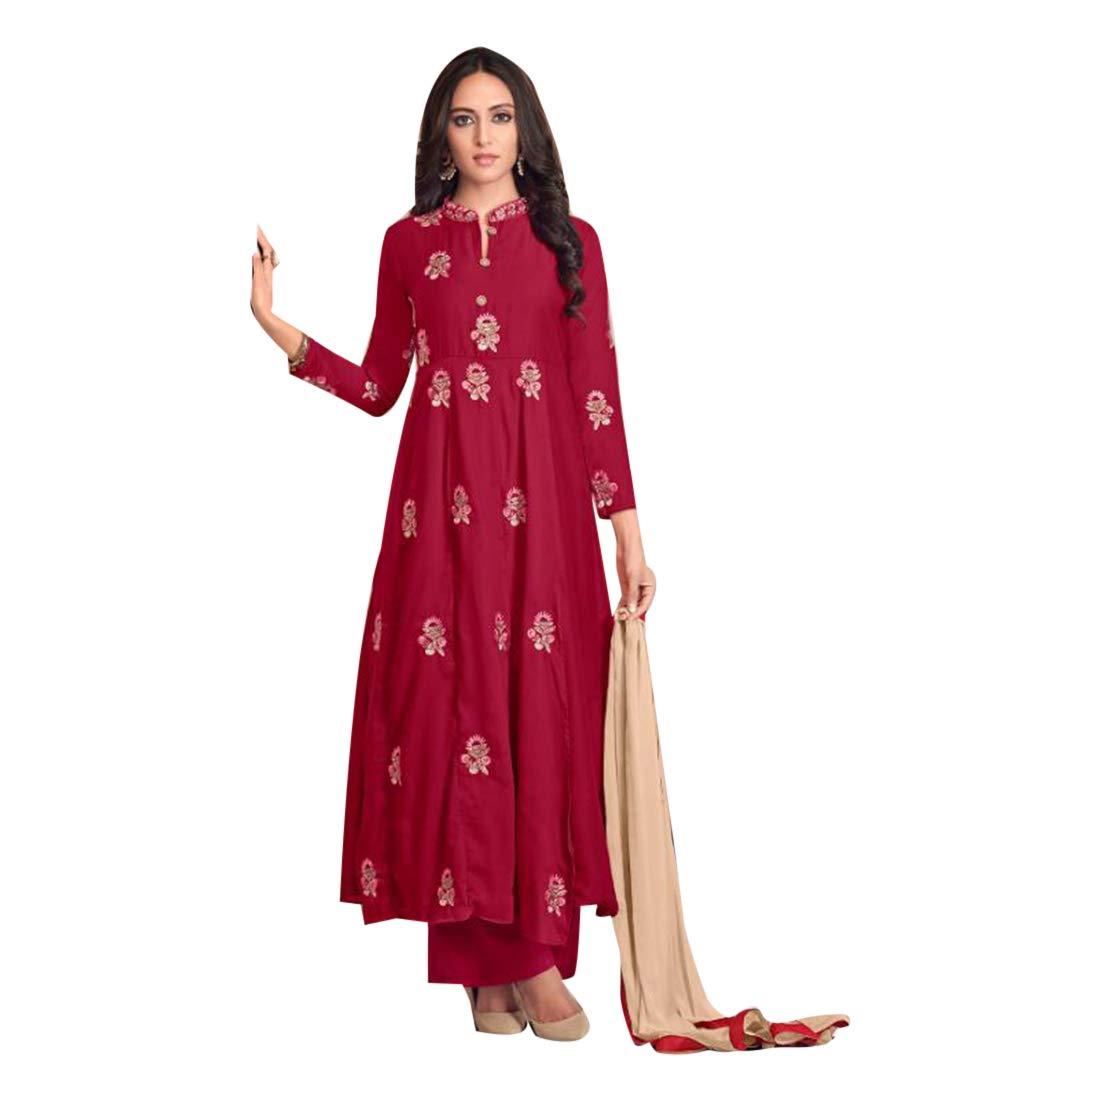 Magenta Ethnic Eid special Designer Maslin Plazo style Salwar Kameez Suit Women Evening Party wear Bespoke 7895 5